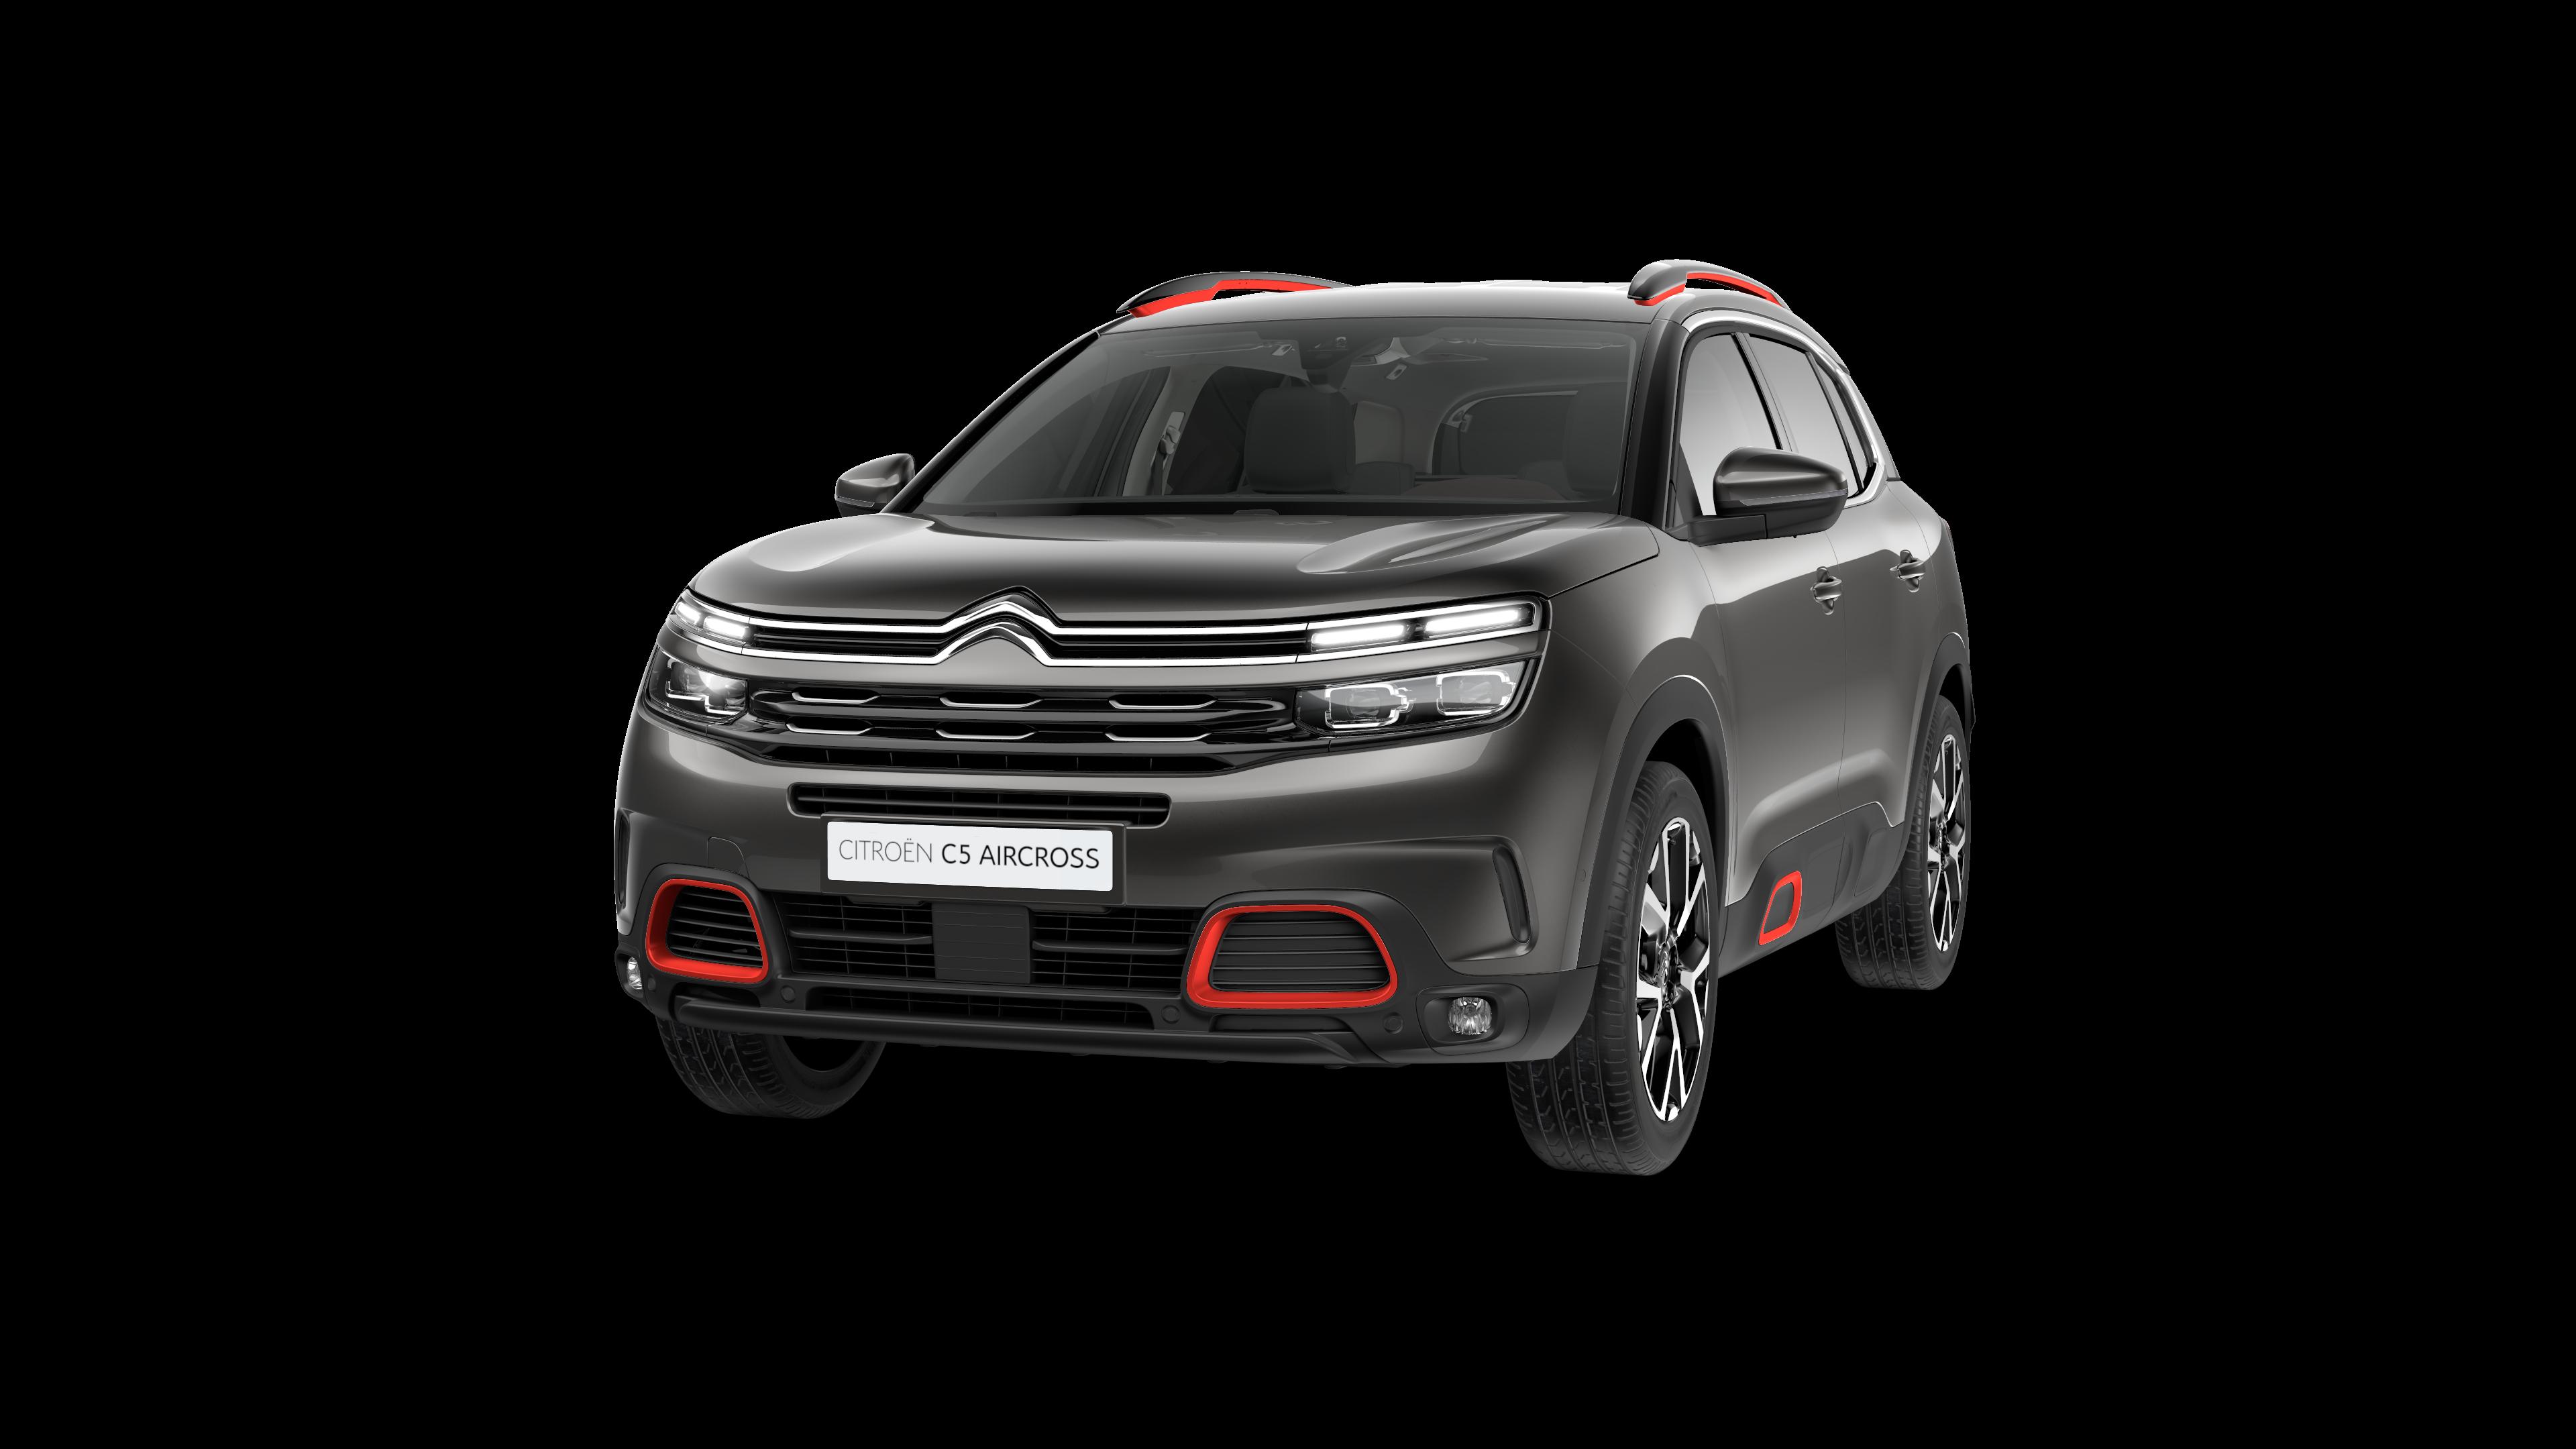 Citroën SUV C5 Aircross en gris platinium